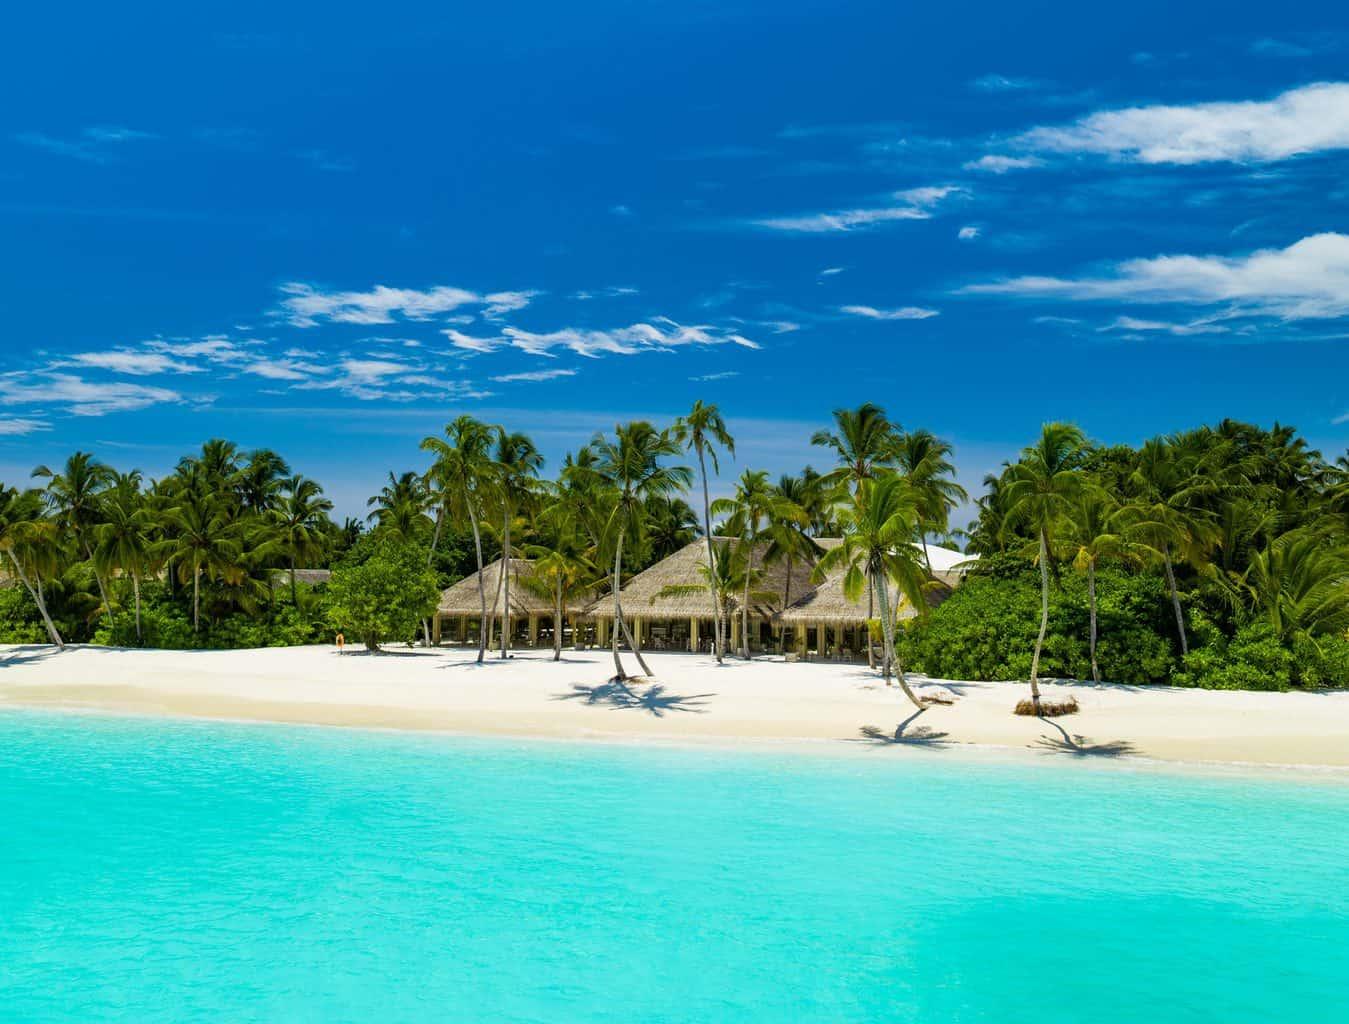 Hoteis-para-Lua-de-Mel-nas-Maldivas-Baglioni-Maldives-2-scaled